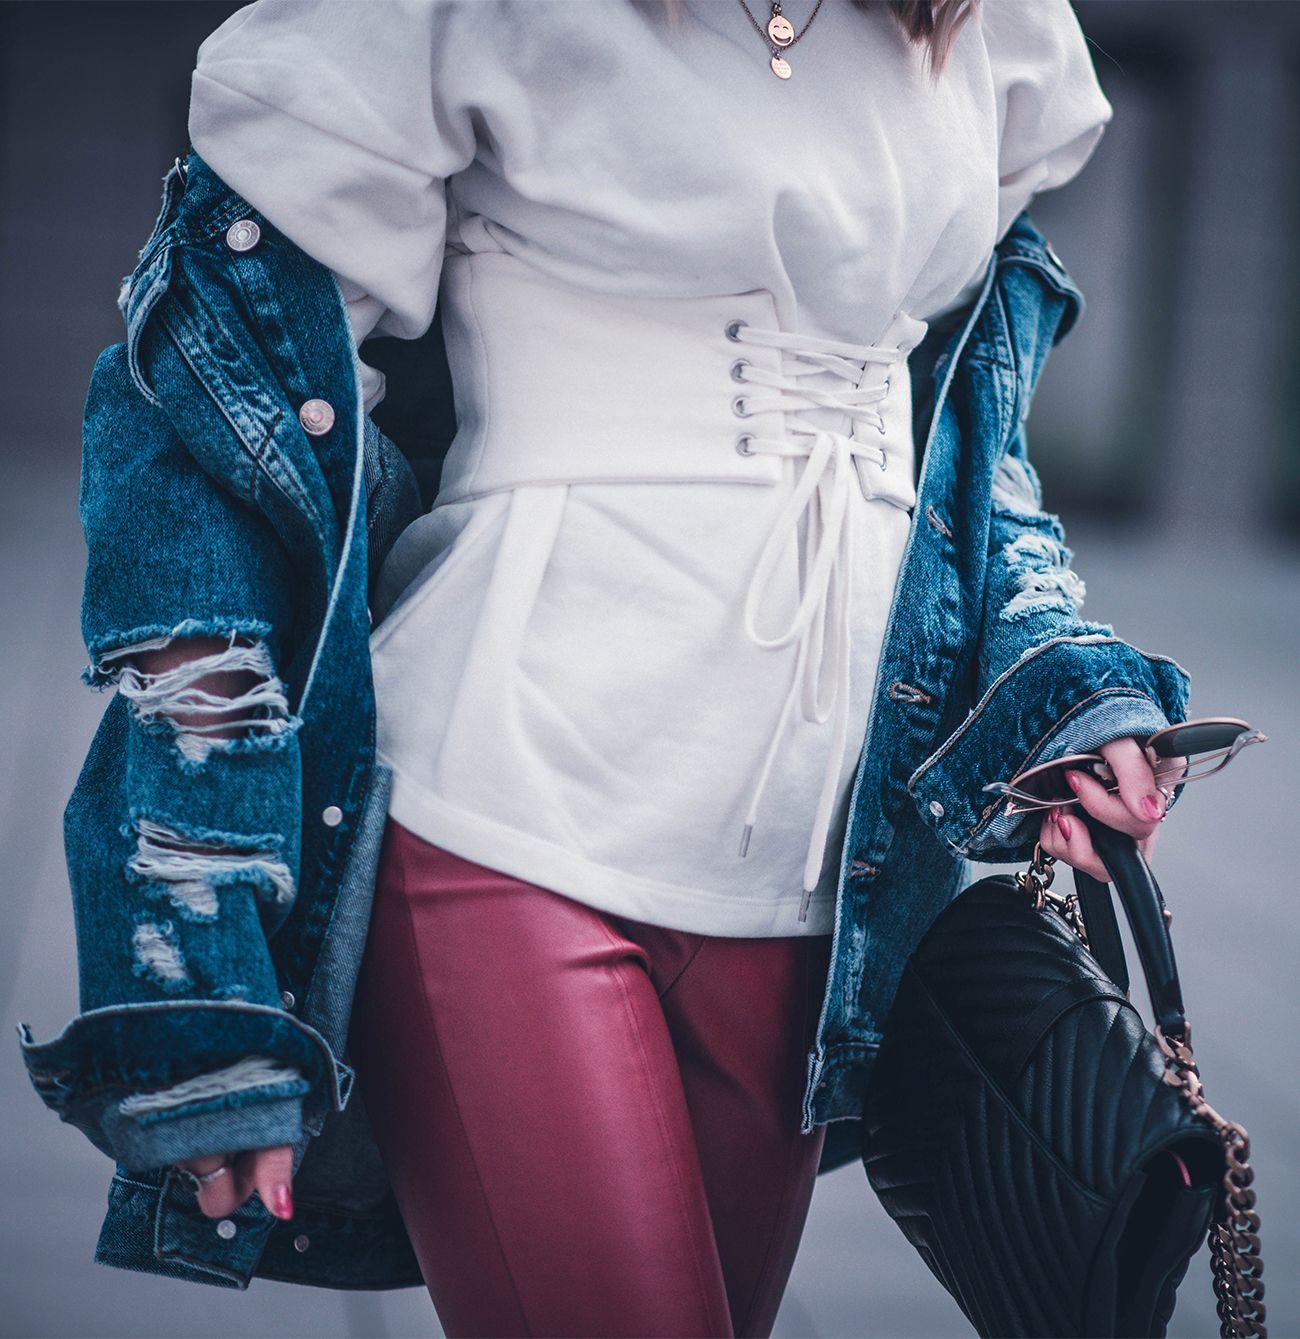 korsett pullover leggins rot ysl tasche  fashion blog münchen